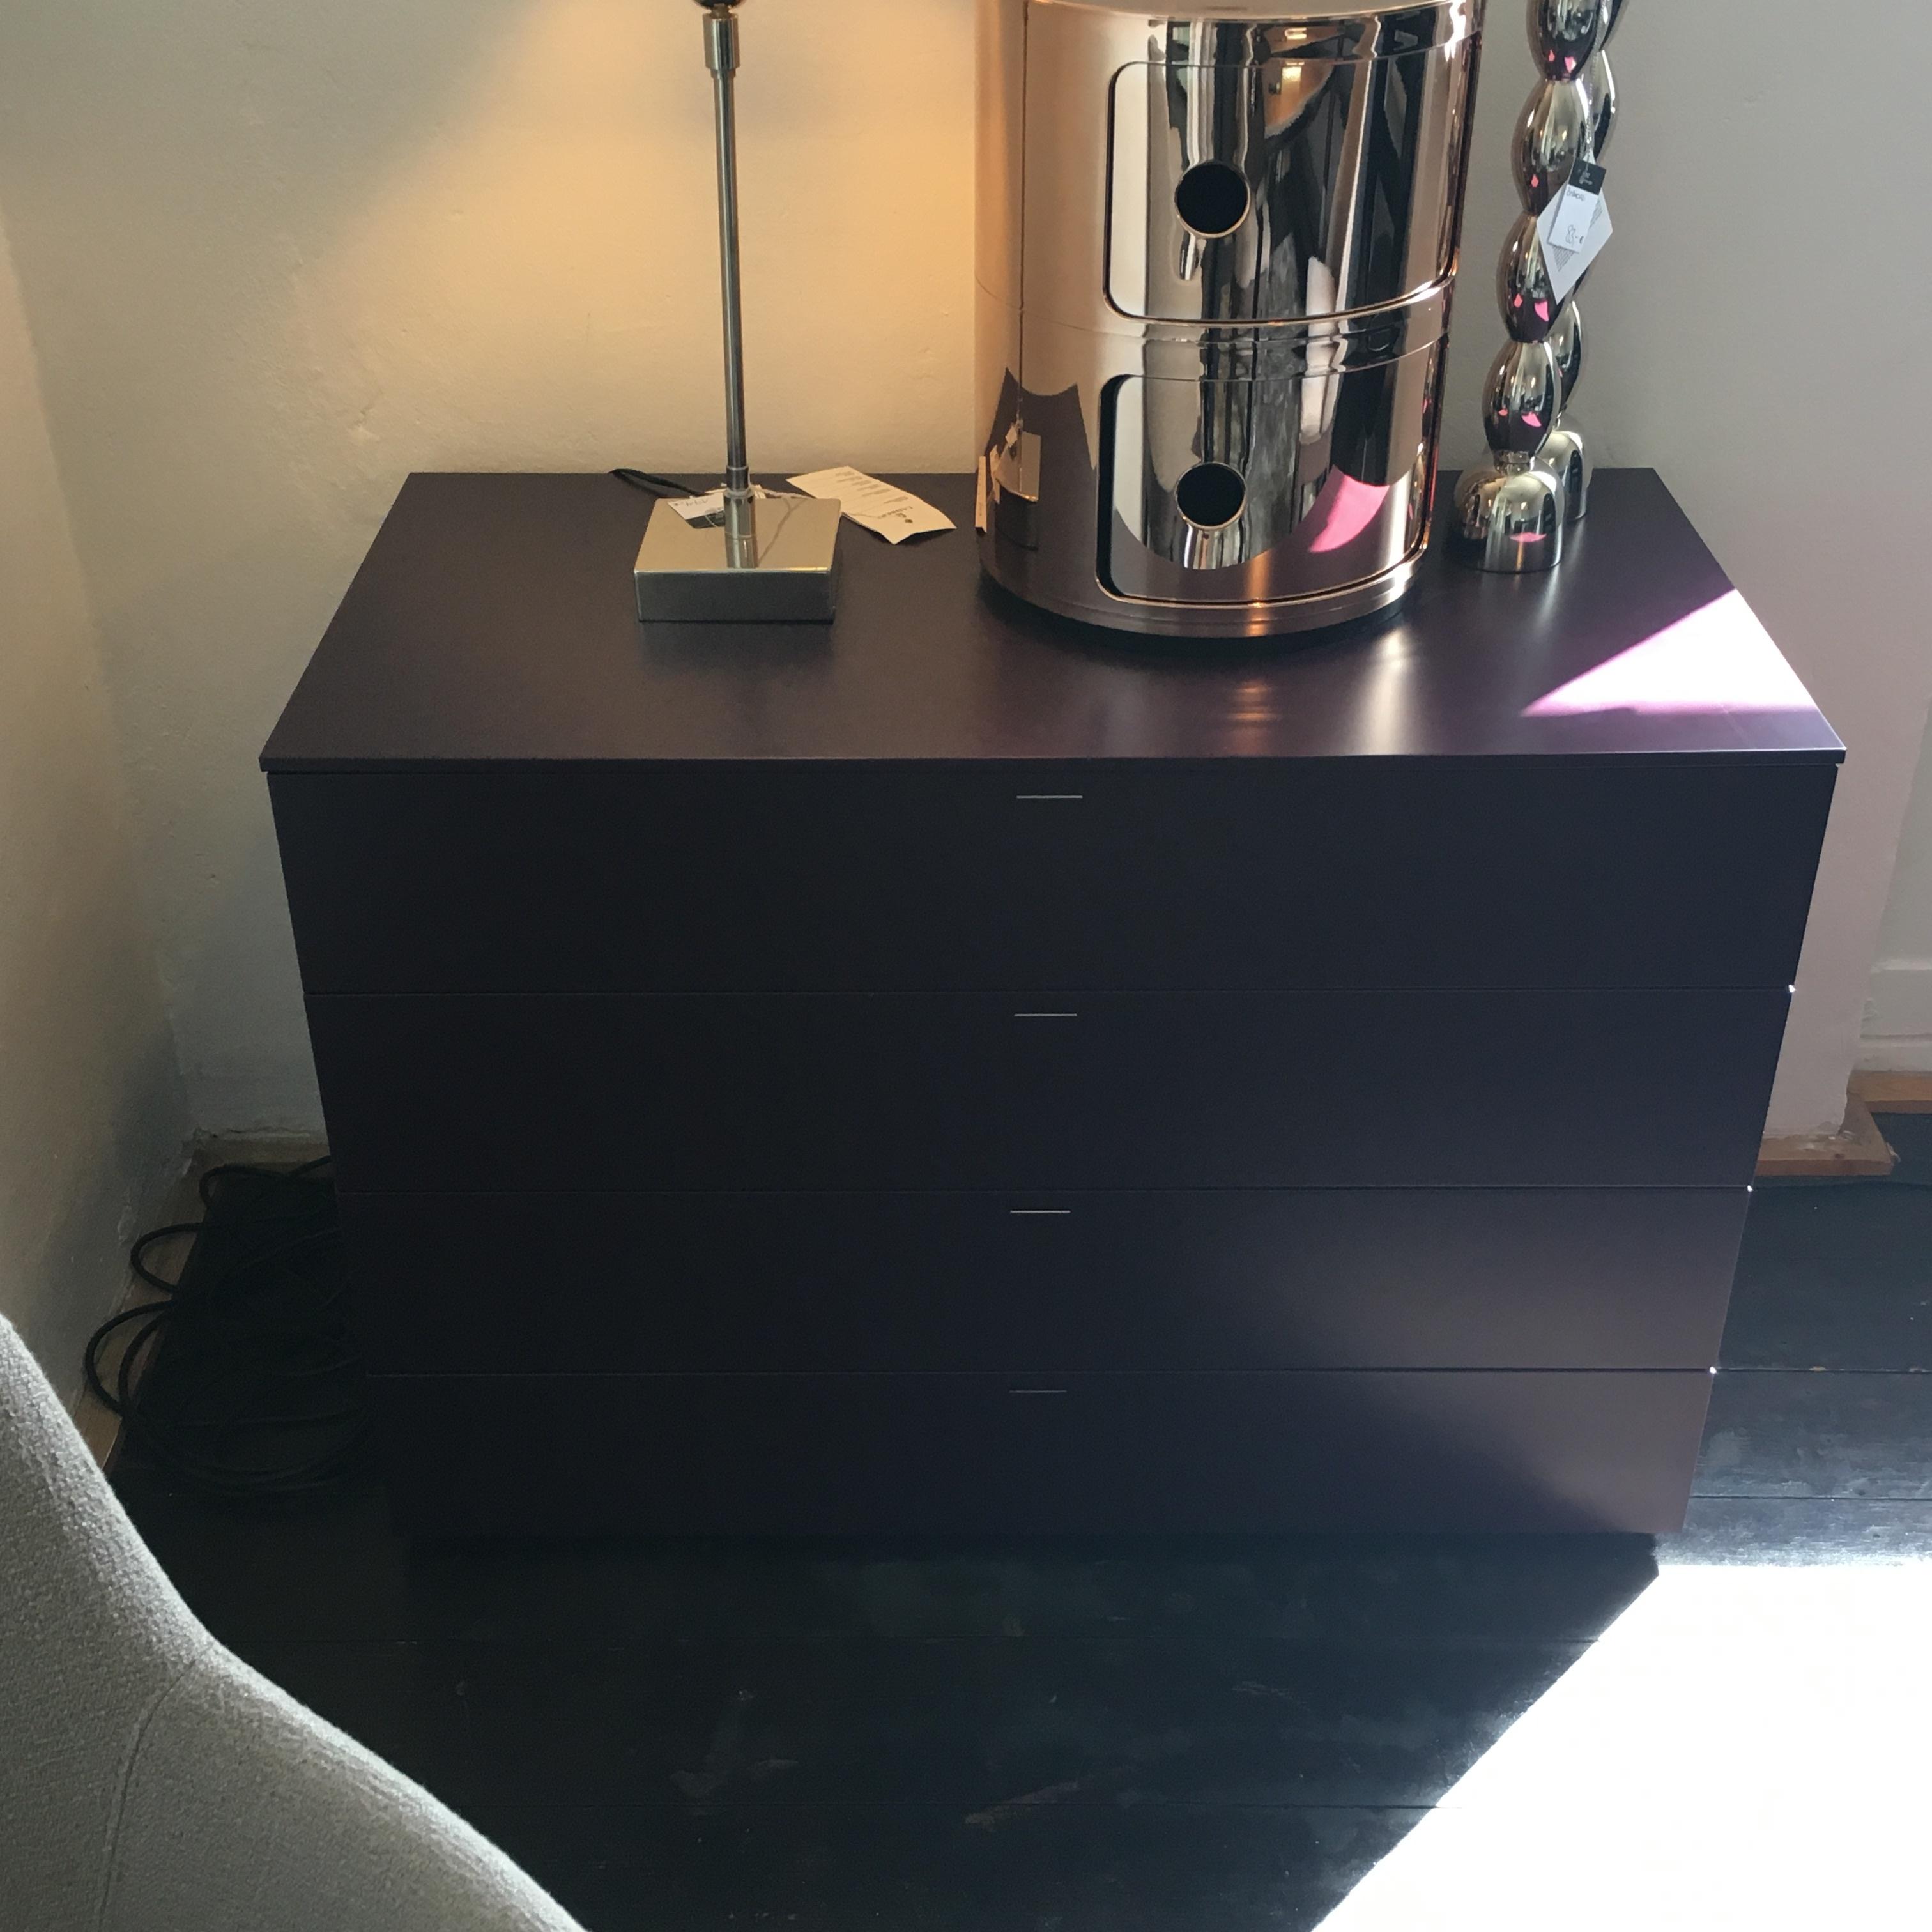 Mein Ausstellungsstück: Dielenmöbel